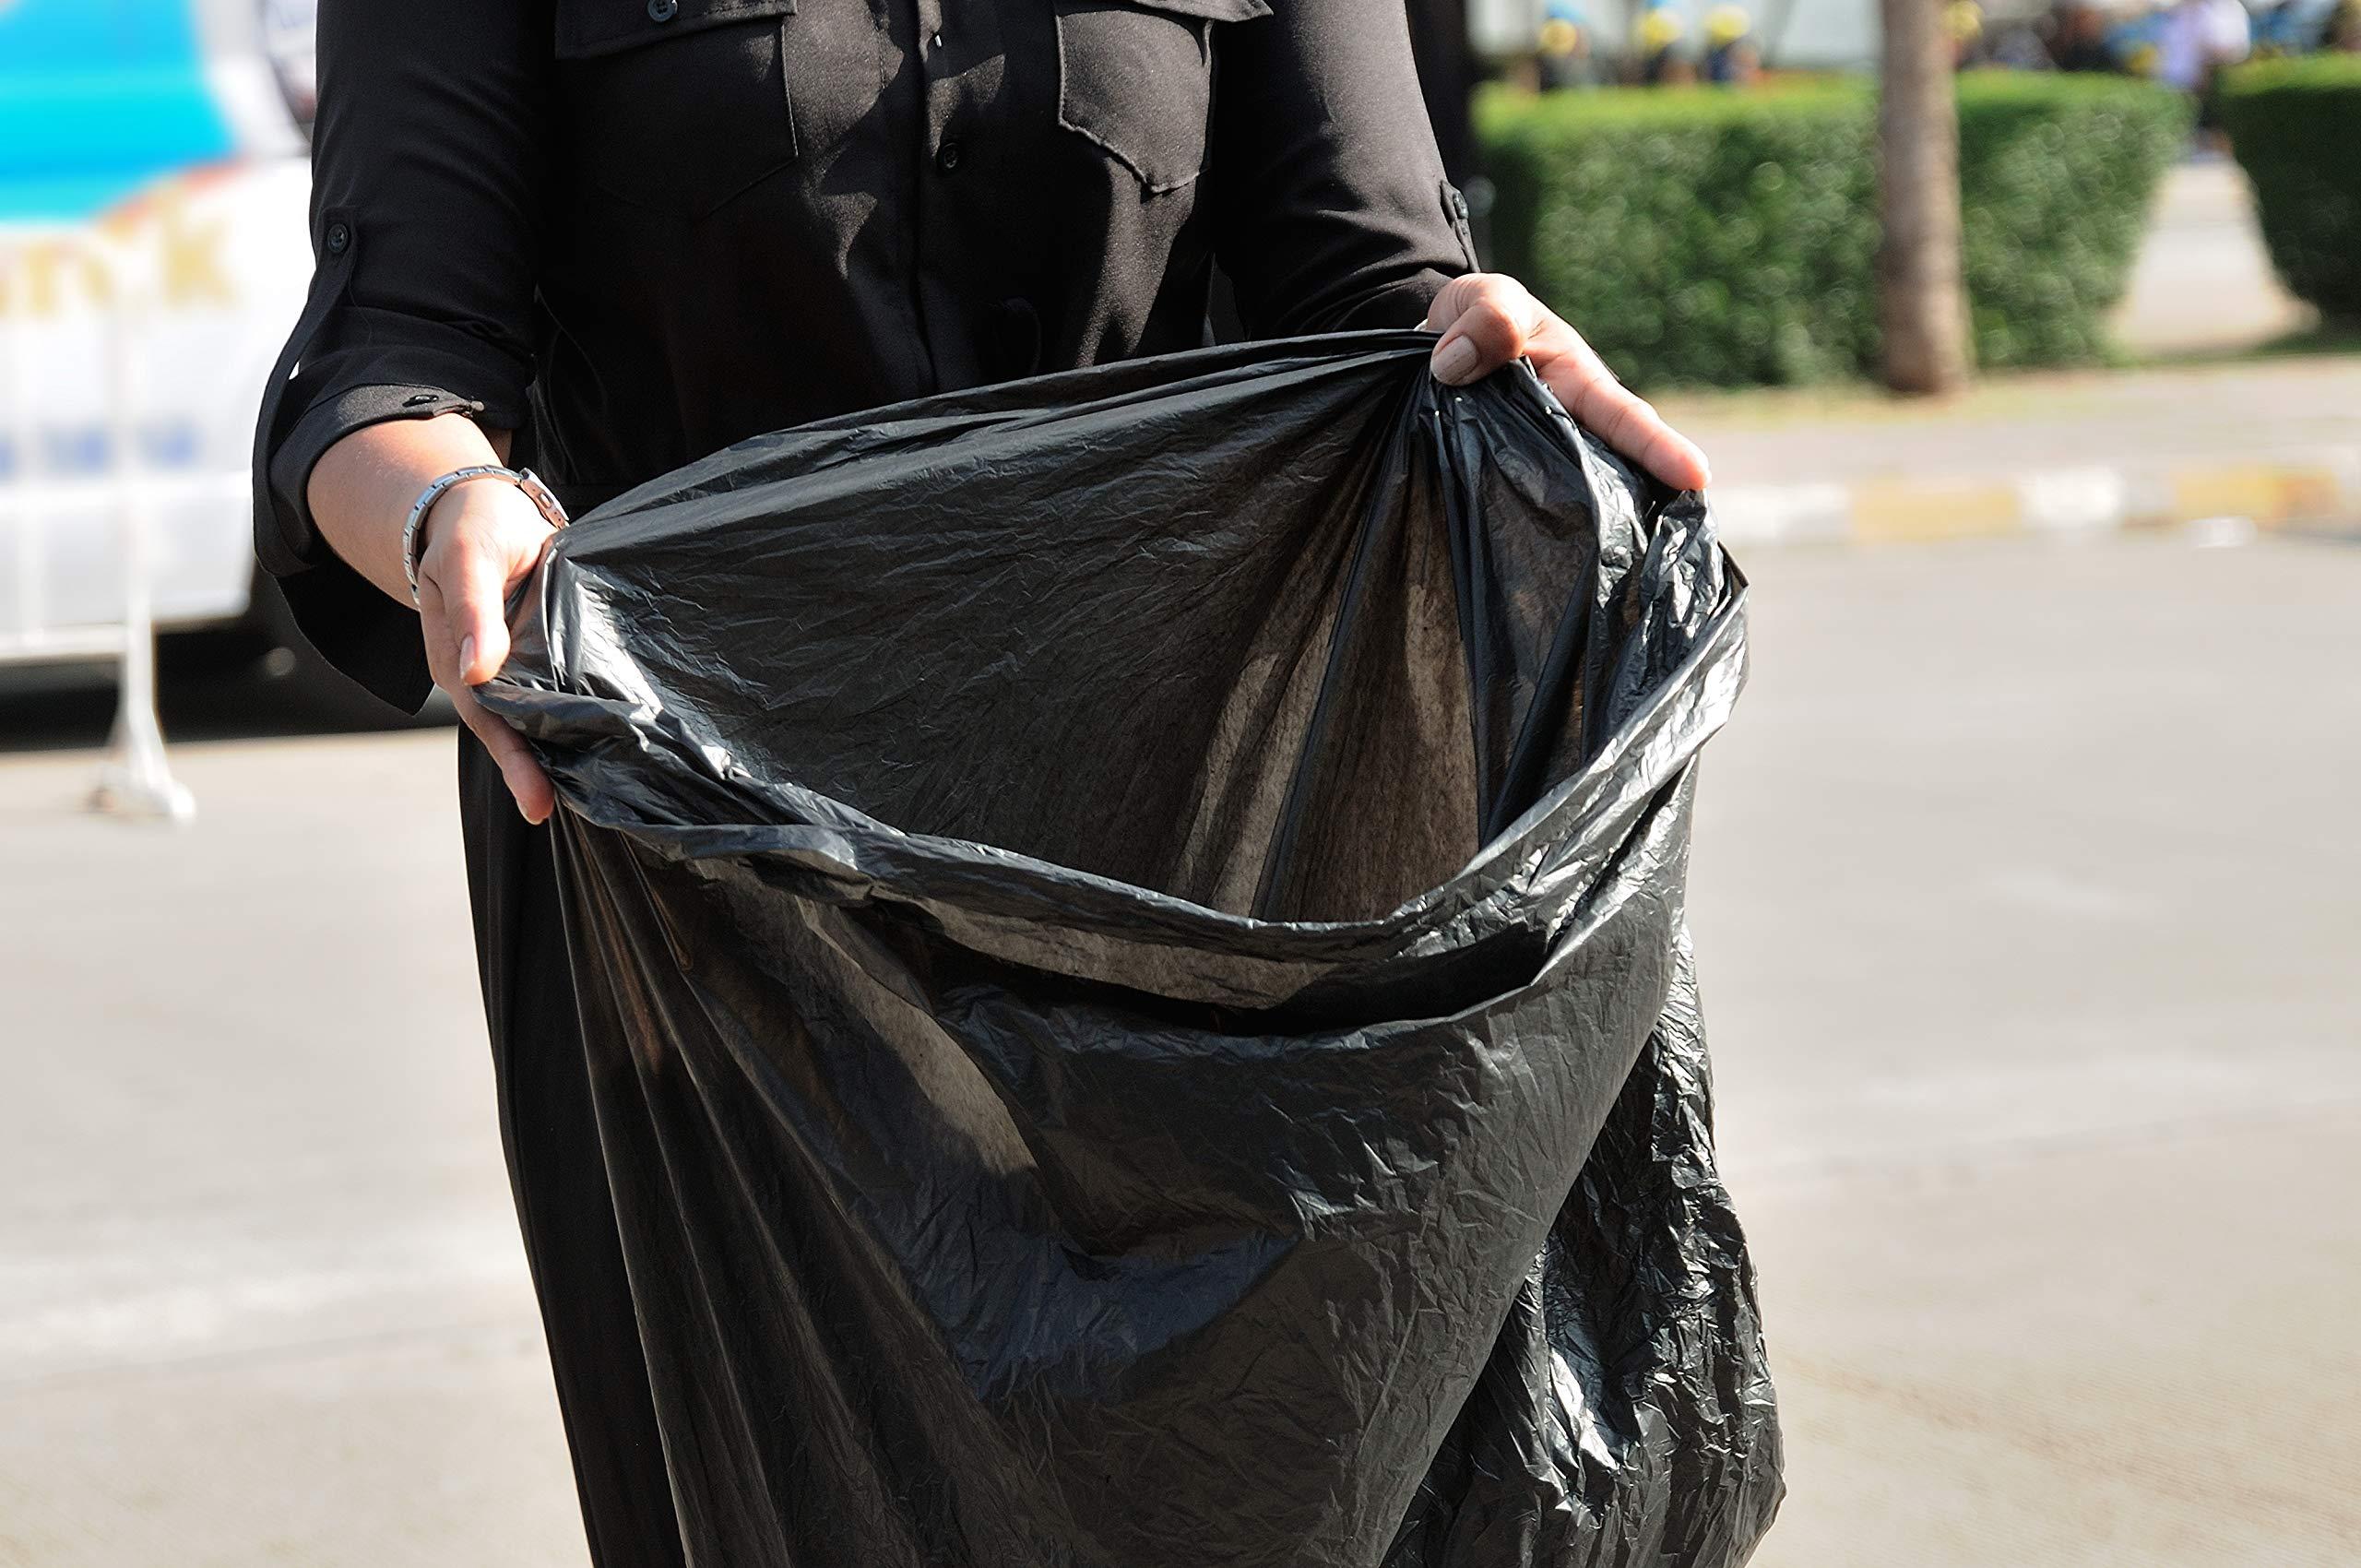 Toughbag 95 Gal Trash bags, Black, 2 Mil, 61x68, 25 Garbage Bags Per Case by ToughBag (Image #6)